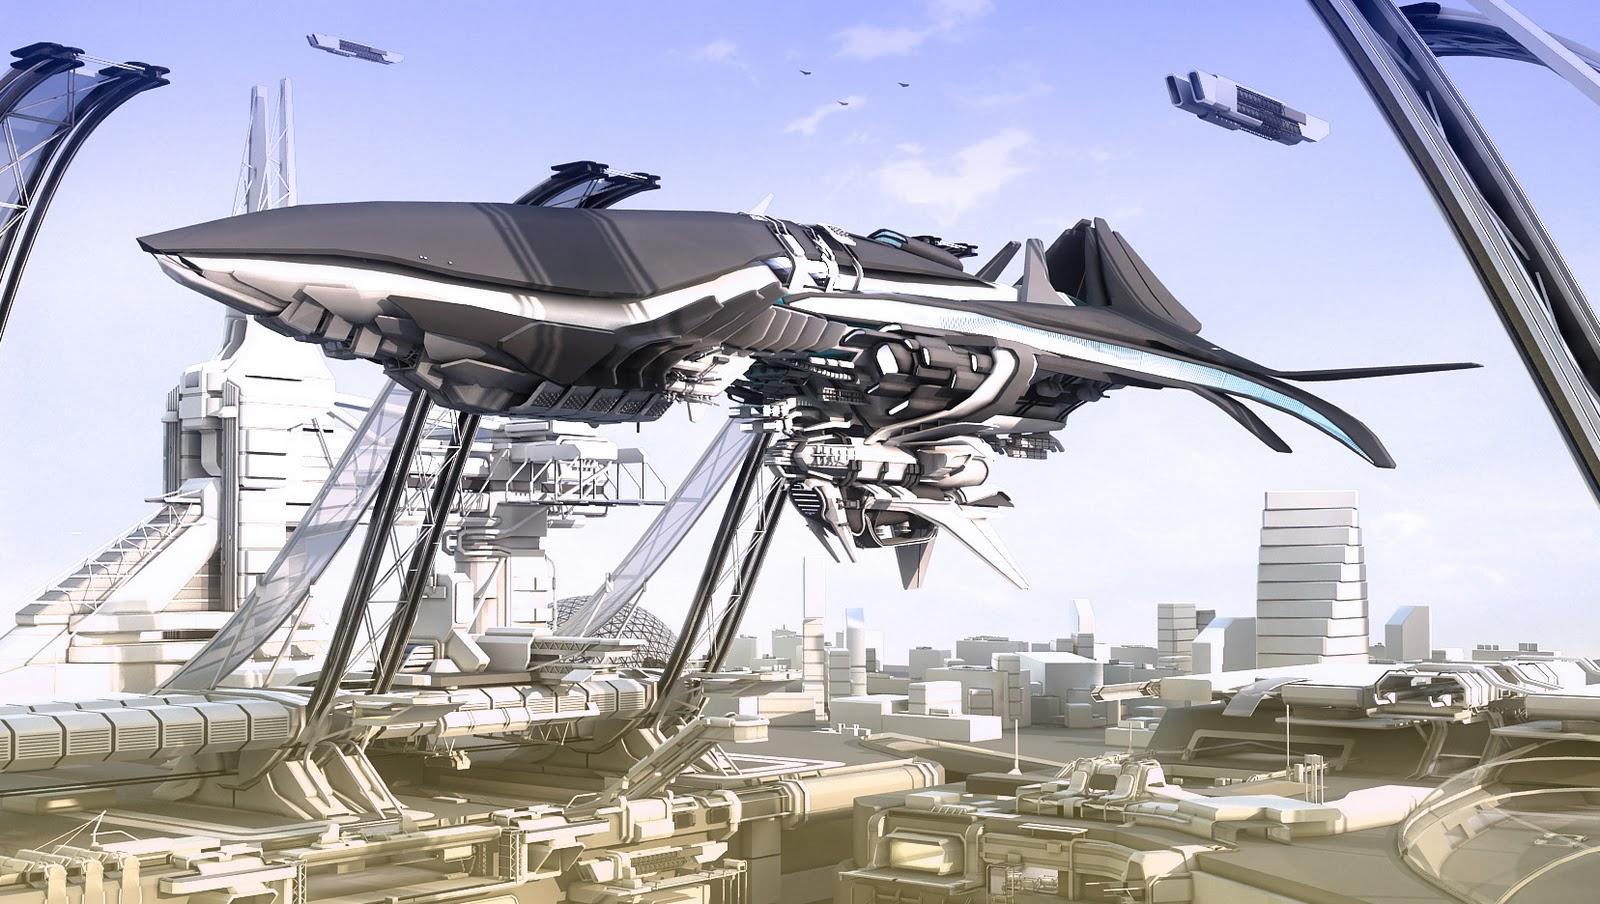 spacecraft of the future - photo #37